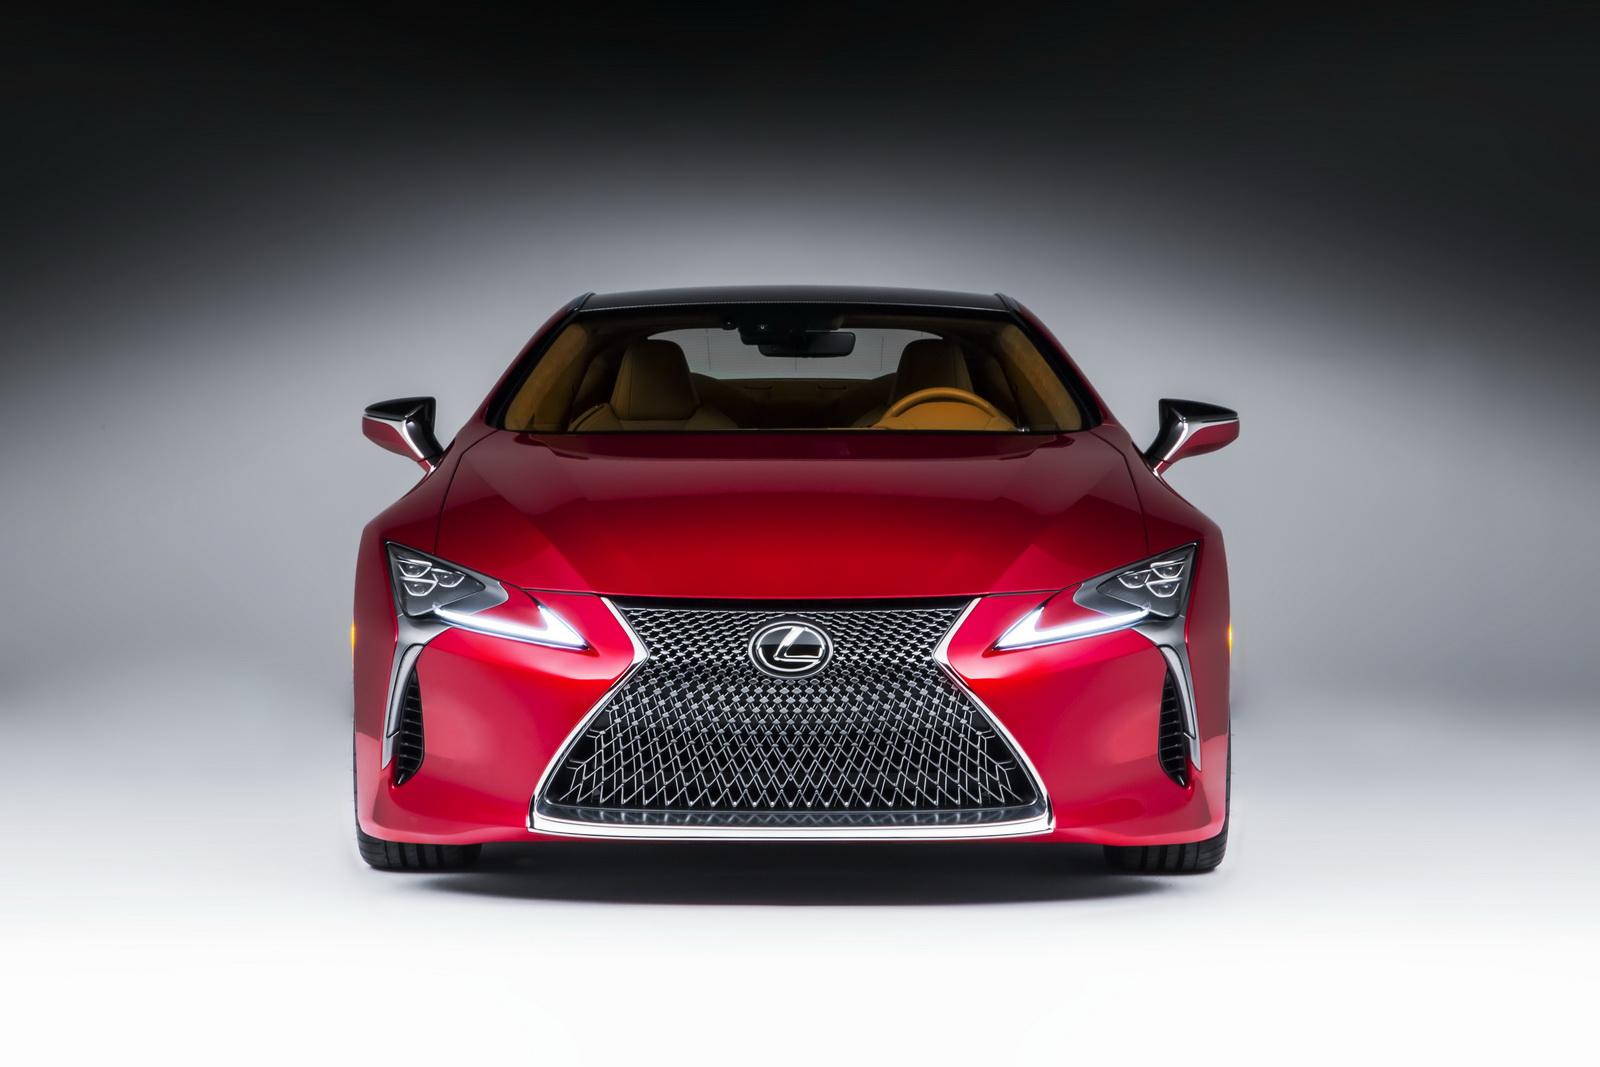 2017-lexus-lc-500-15